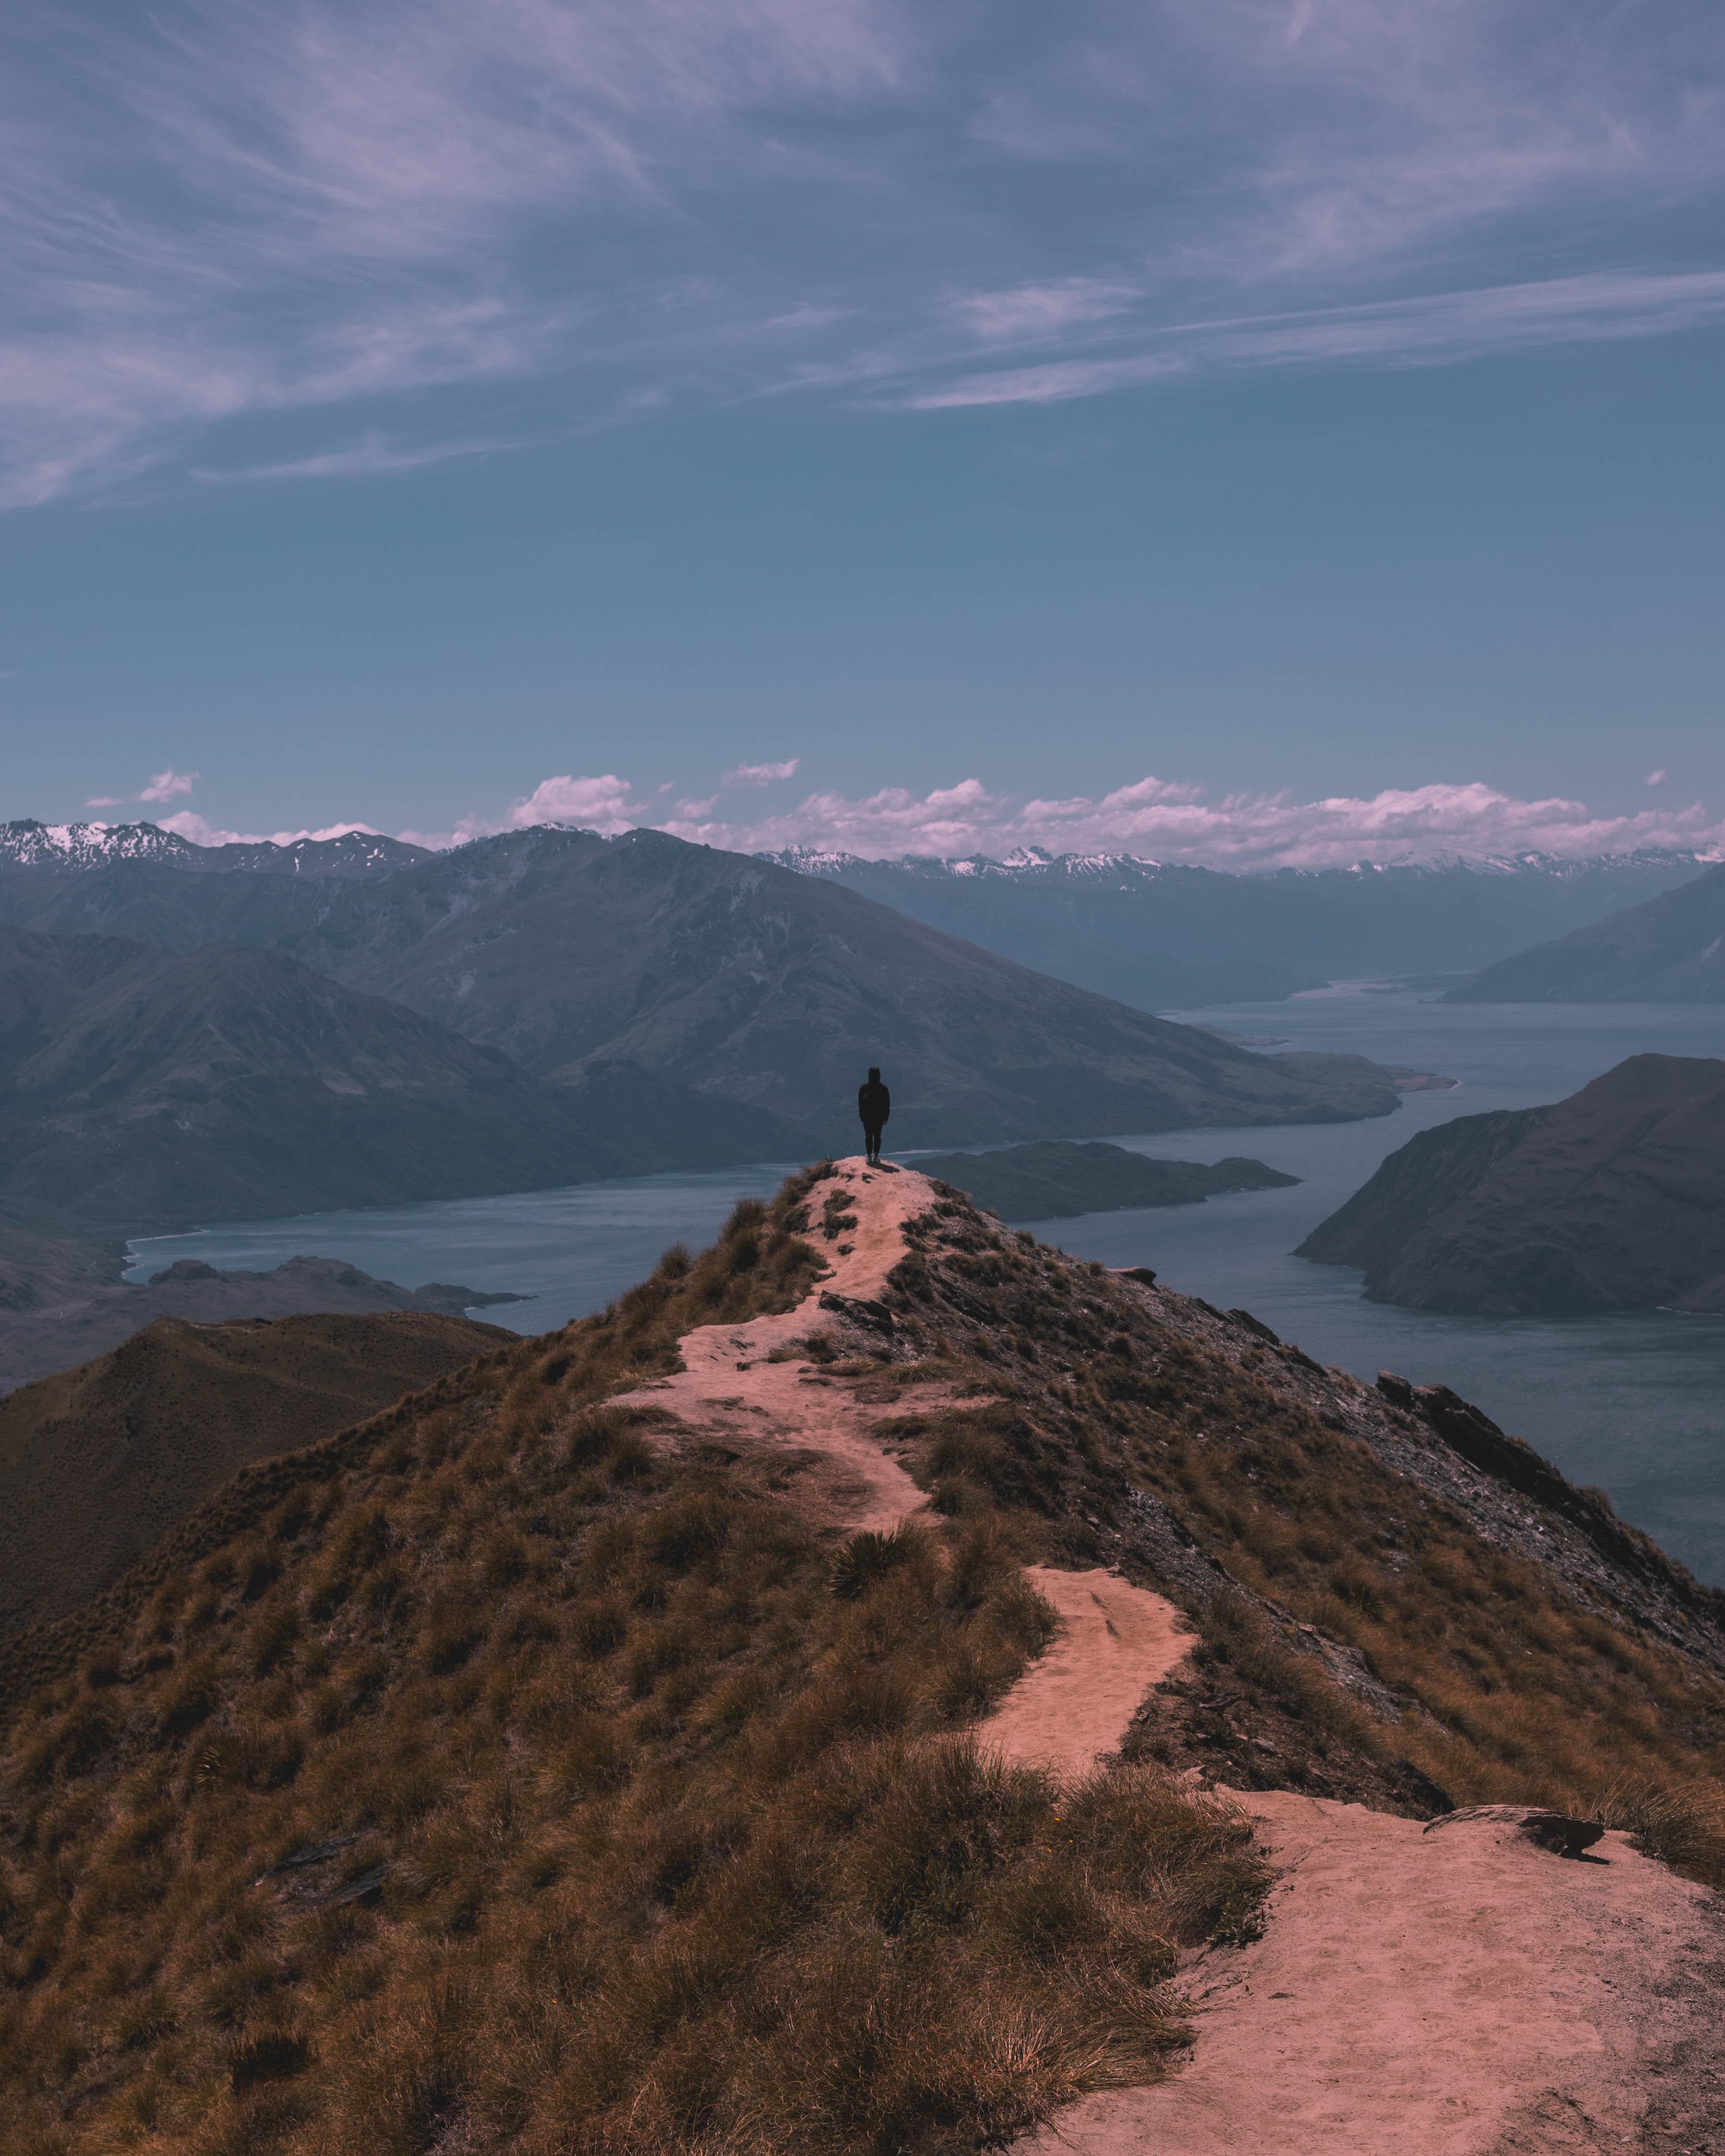 trekking hiking doğa yürüyüşü outdoor patika